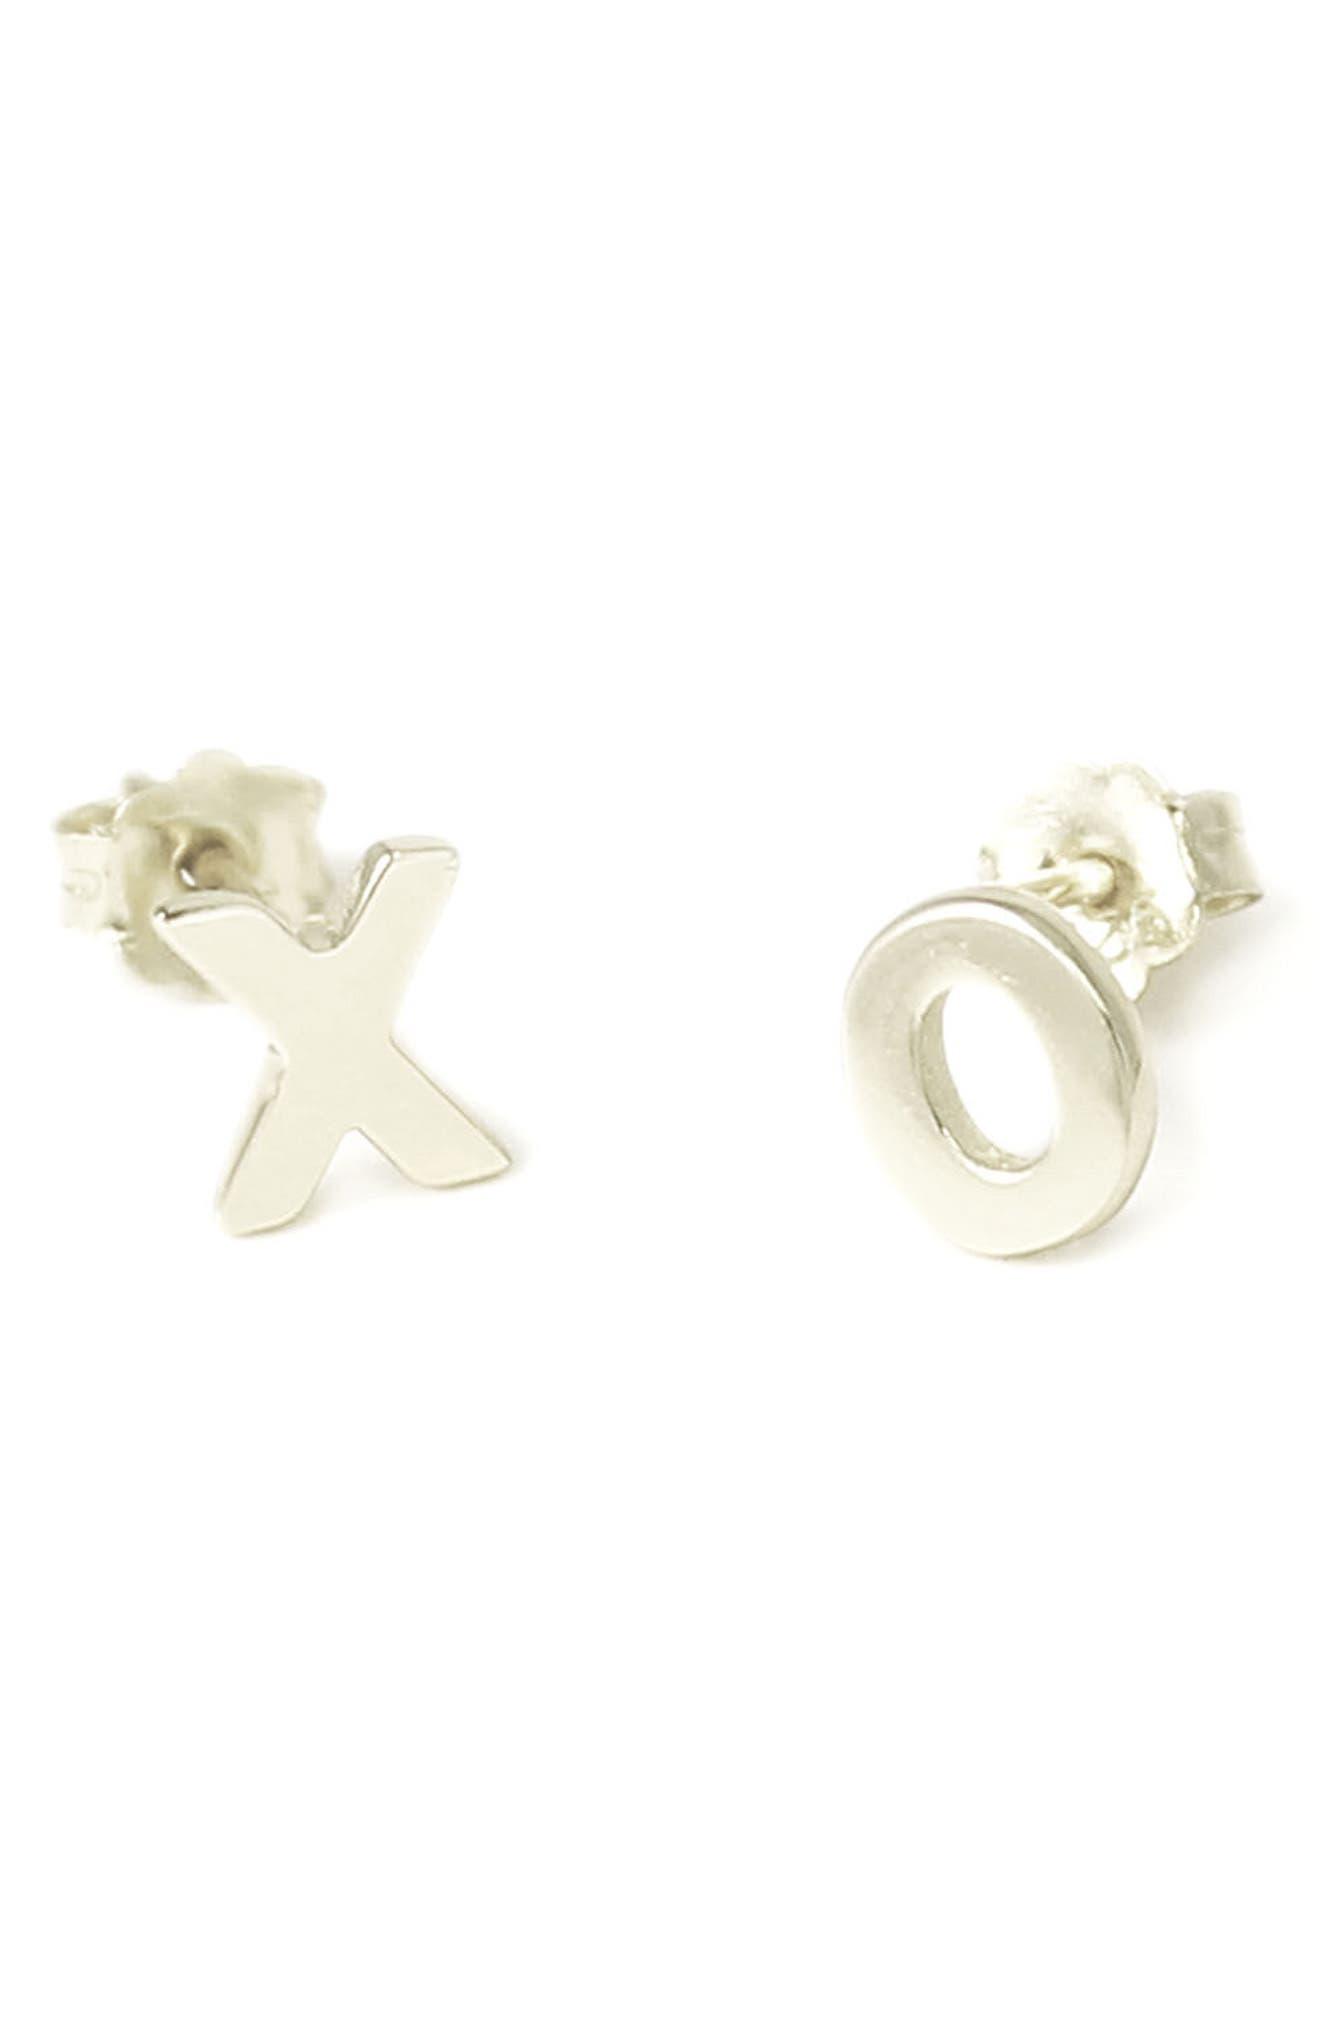 XO Stud Earrings,                         Main,                         color, Silver